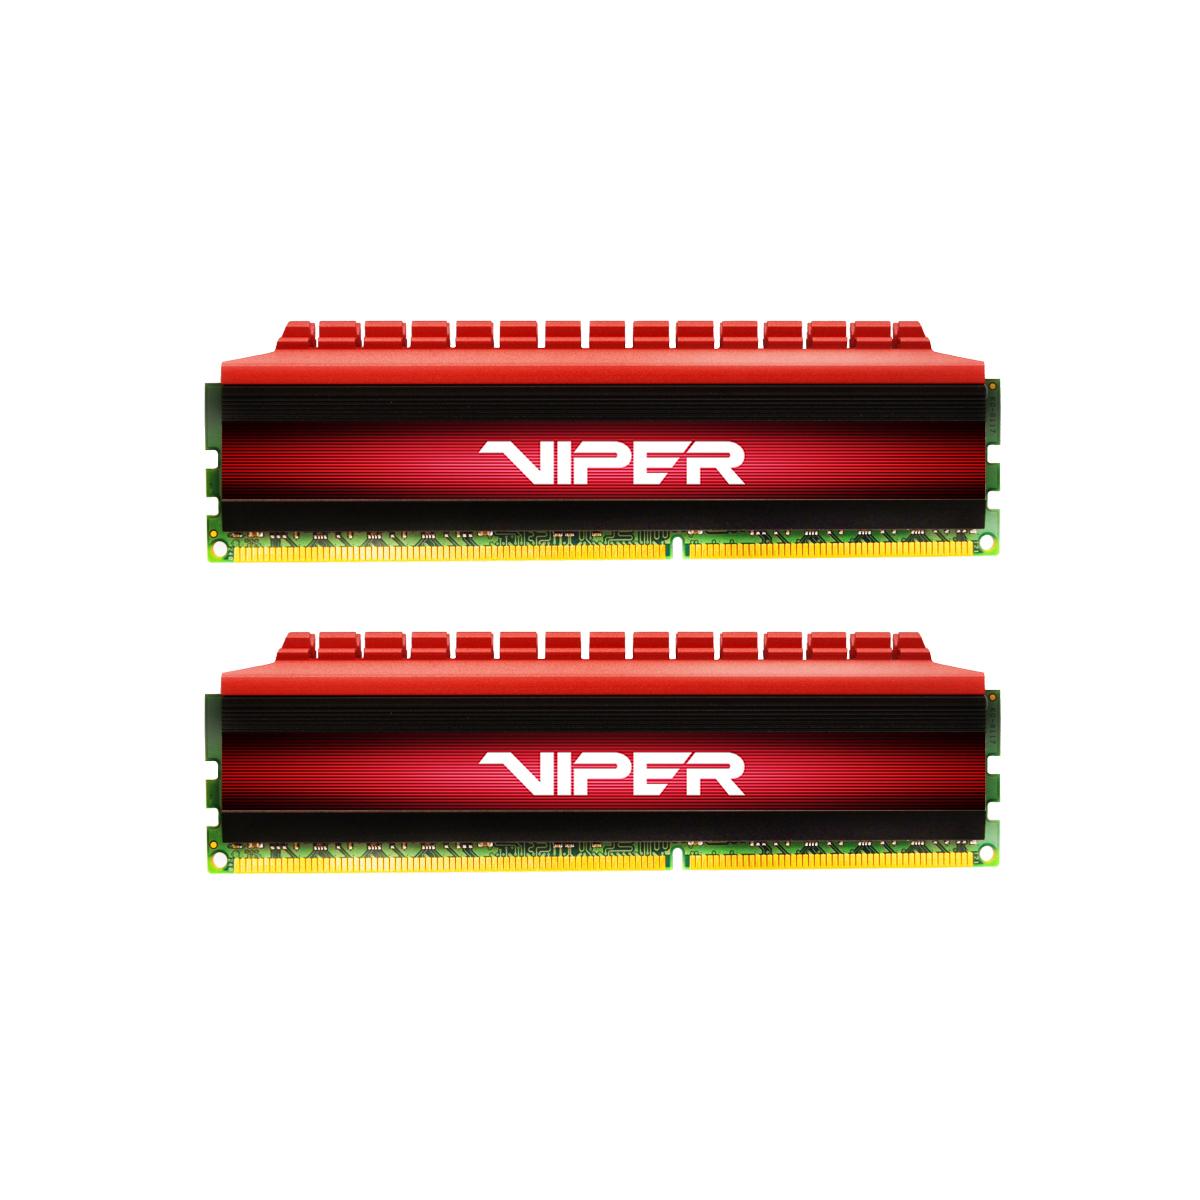 Patriot Memory 16GB PC4-29800 memory module DDR4 3733 MHz